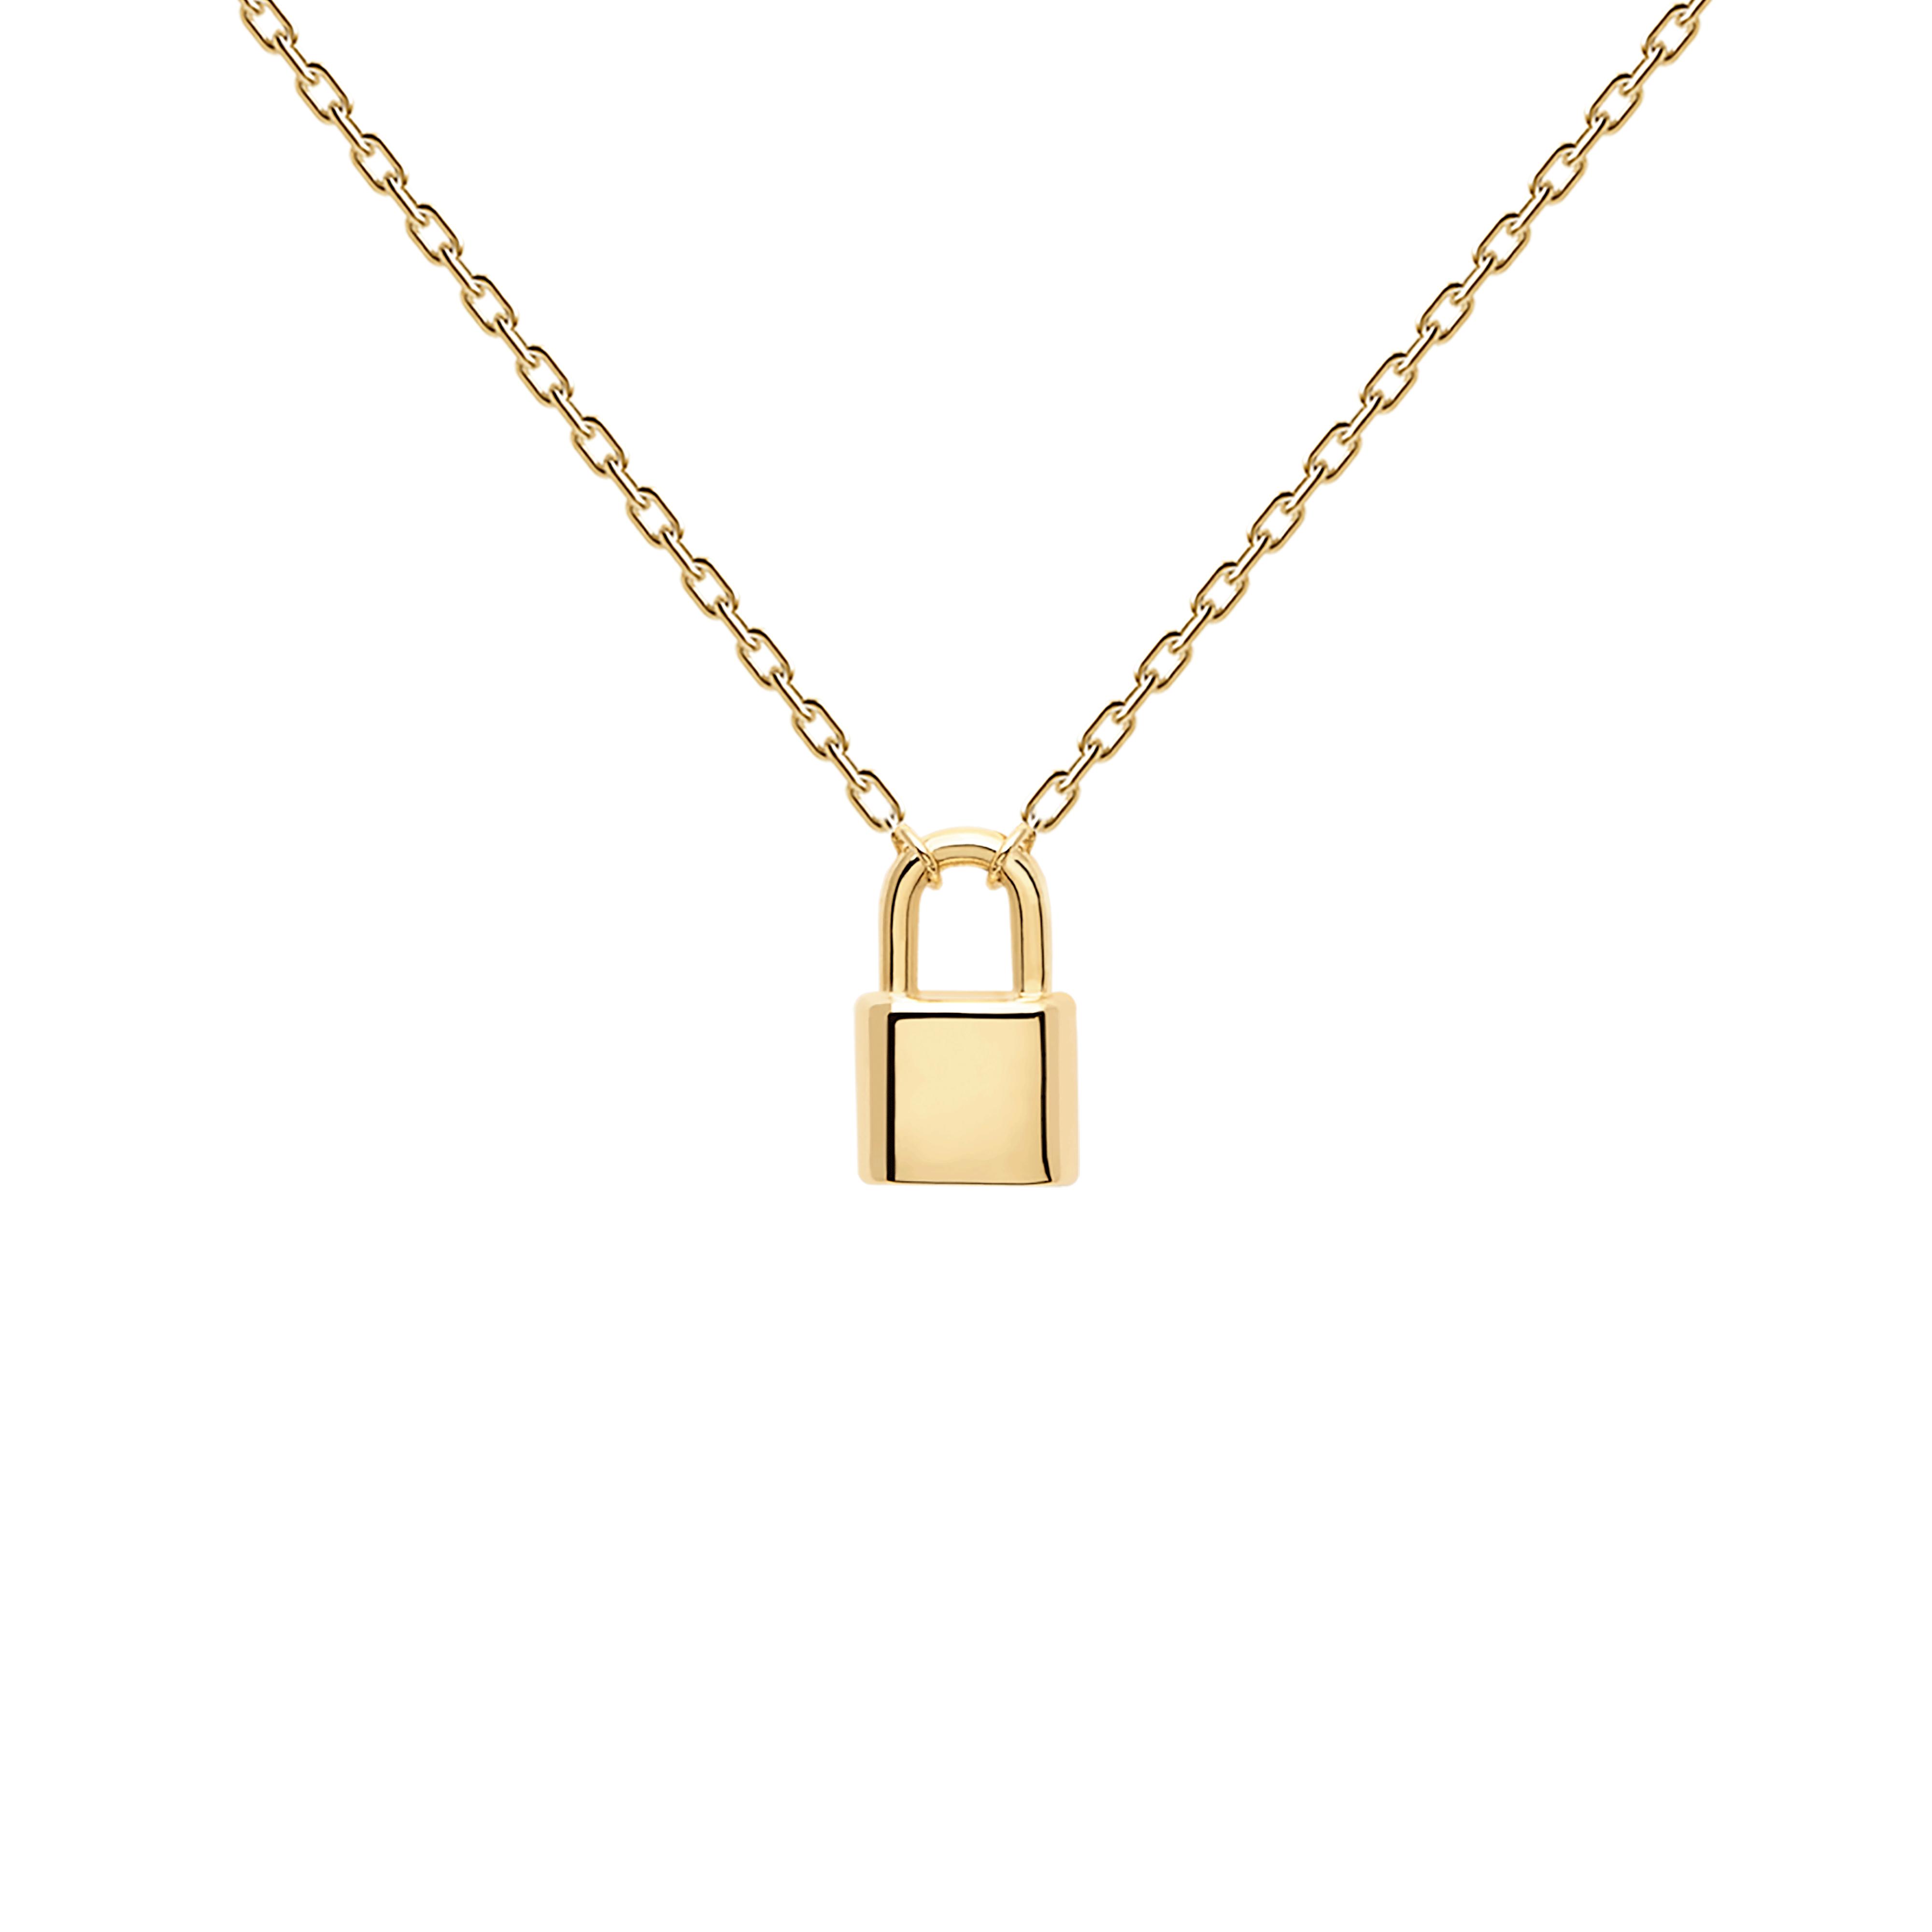 Bond Gold Necklace